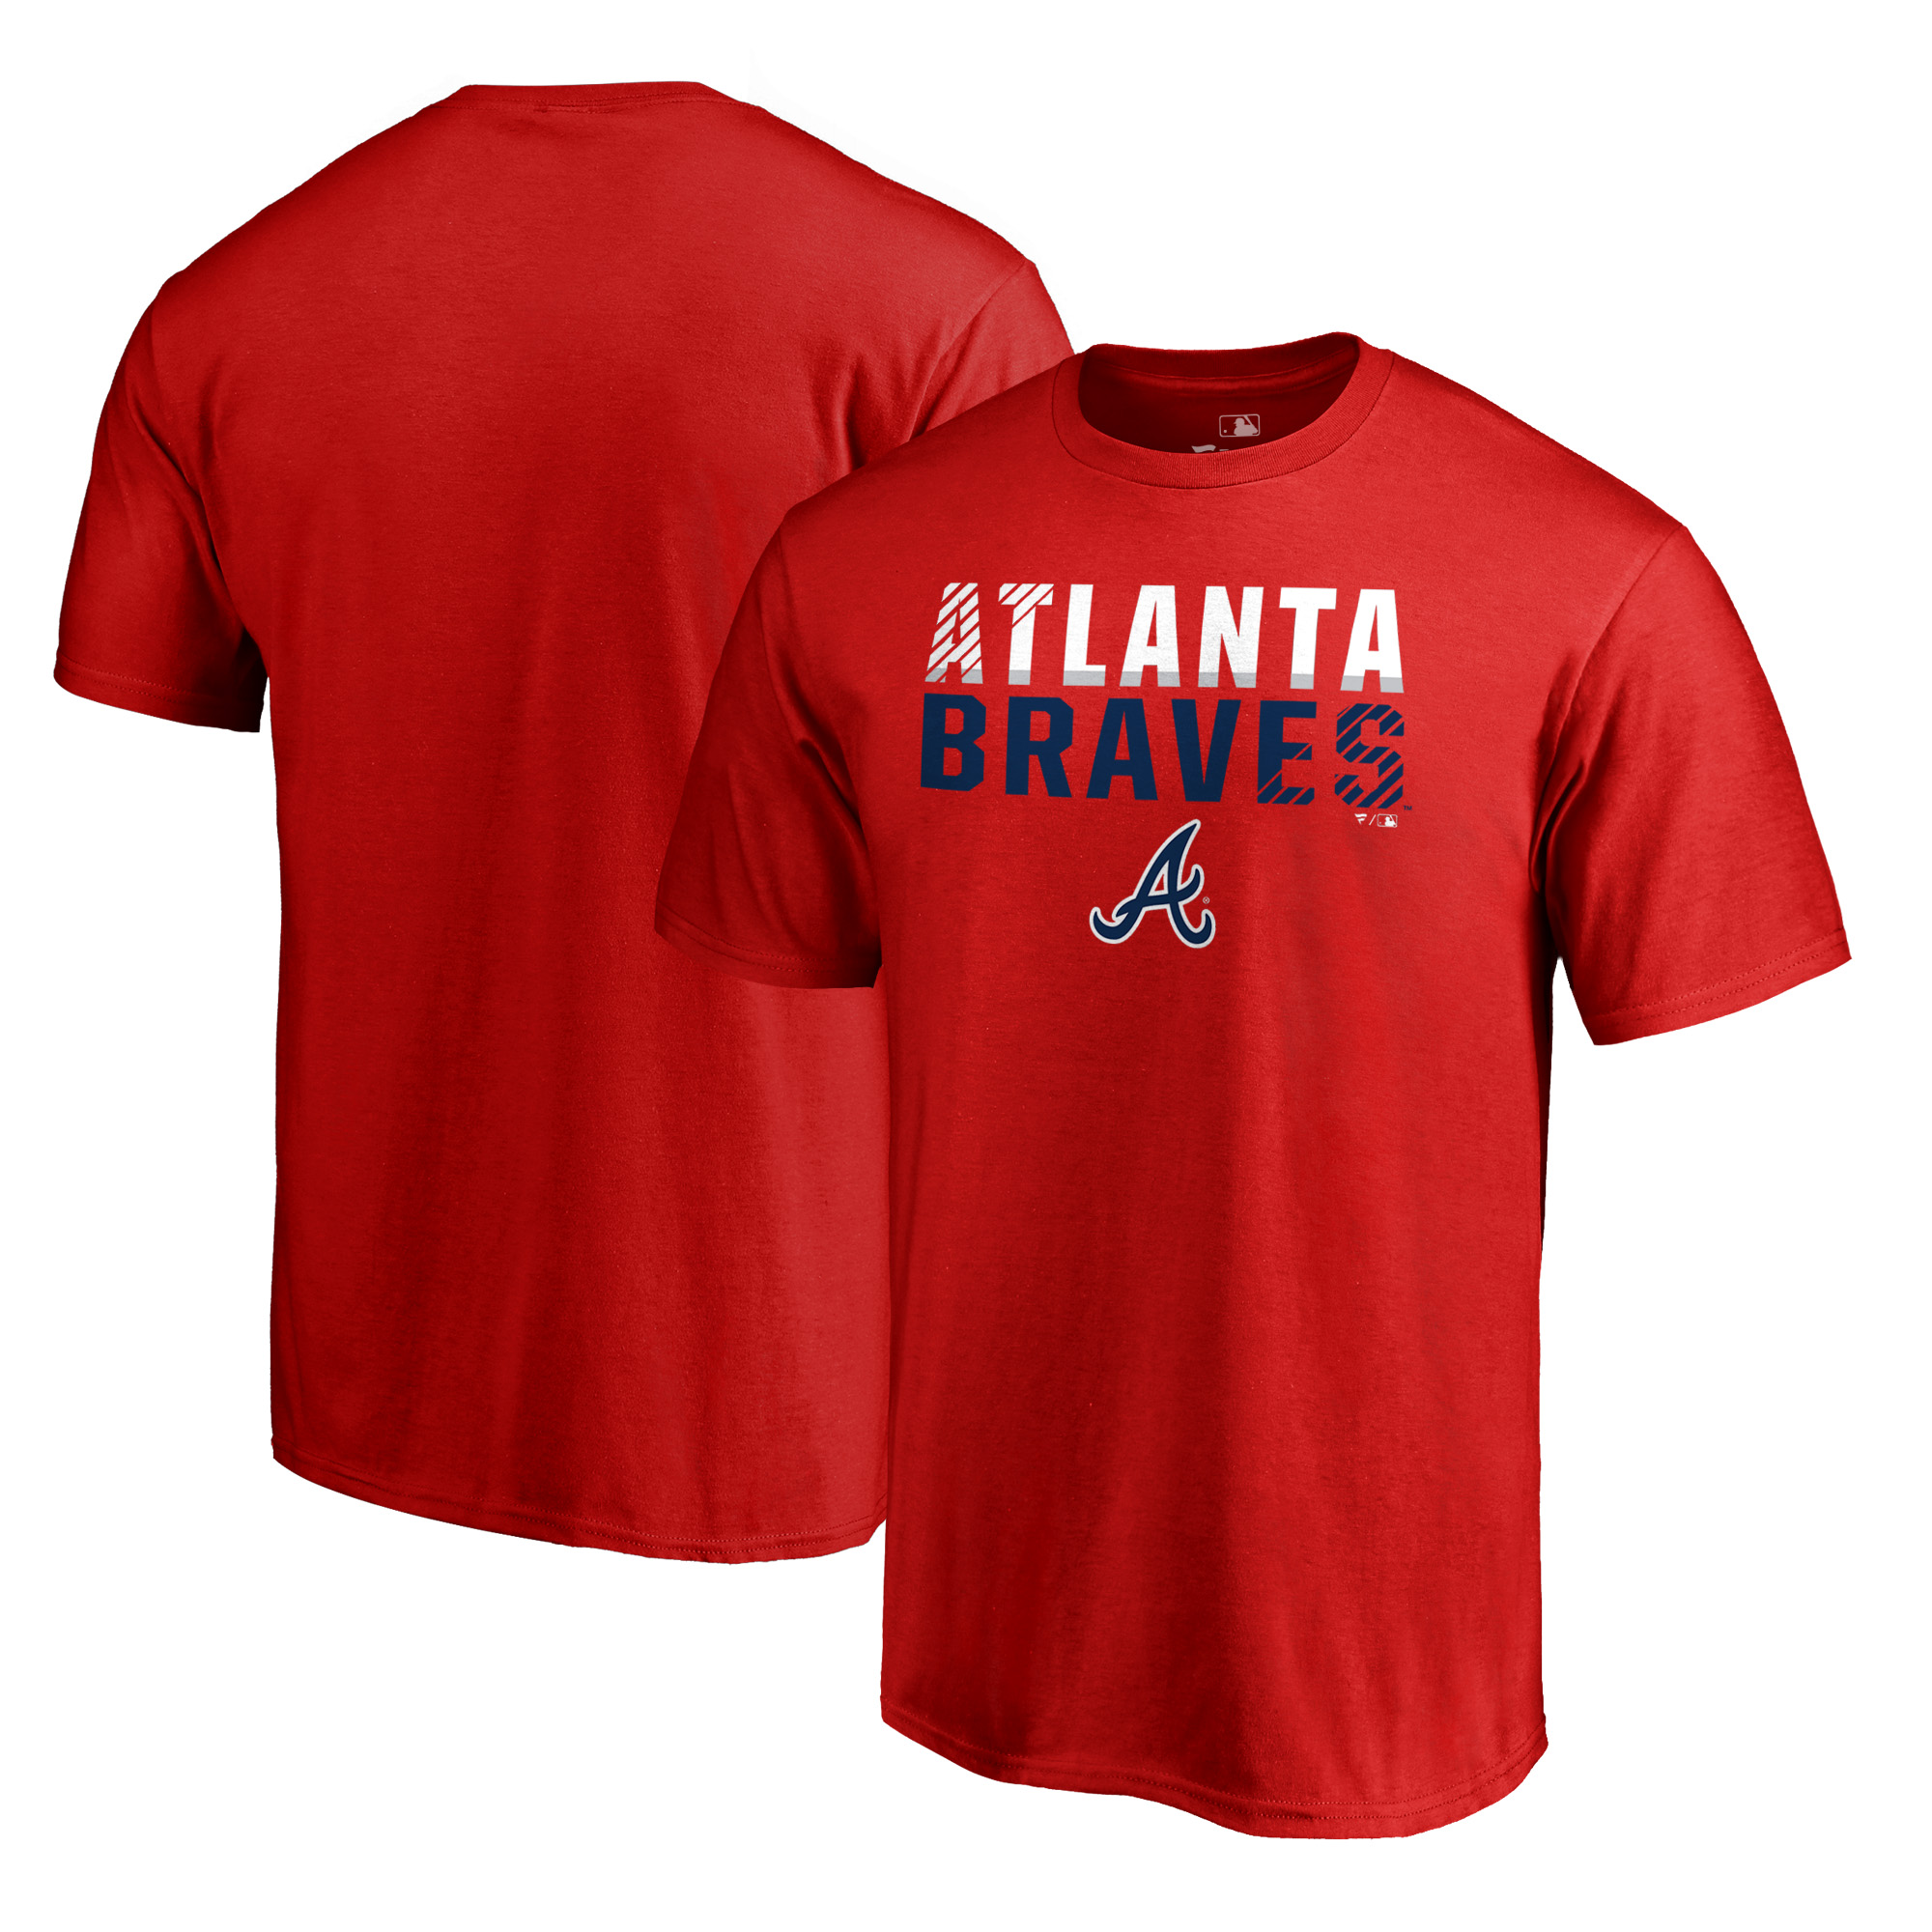 Atlanta Braves Fanatics Branded Team Fade Out T-Shirt - Red